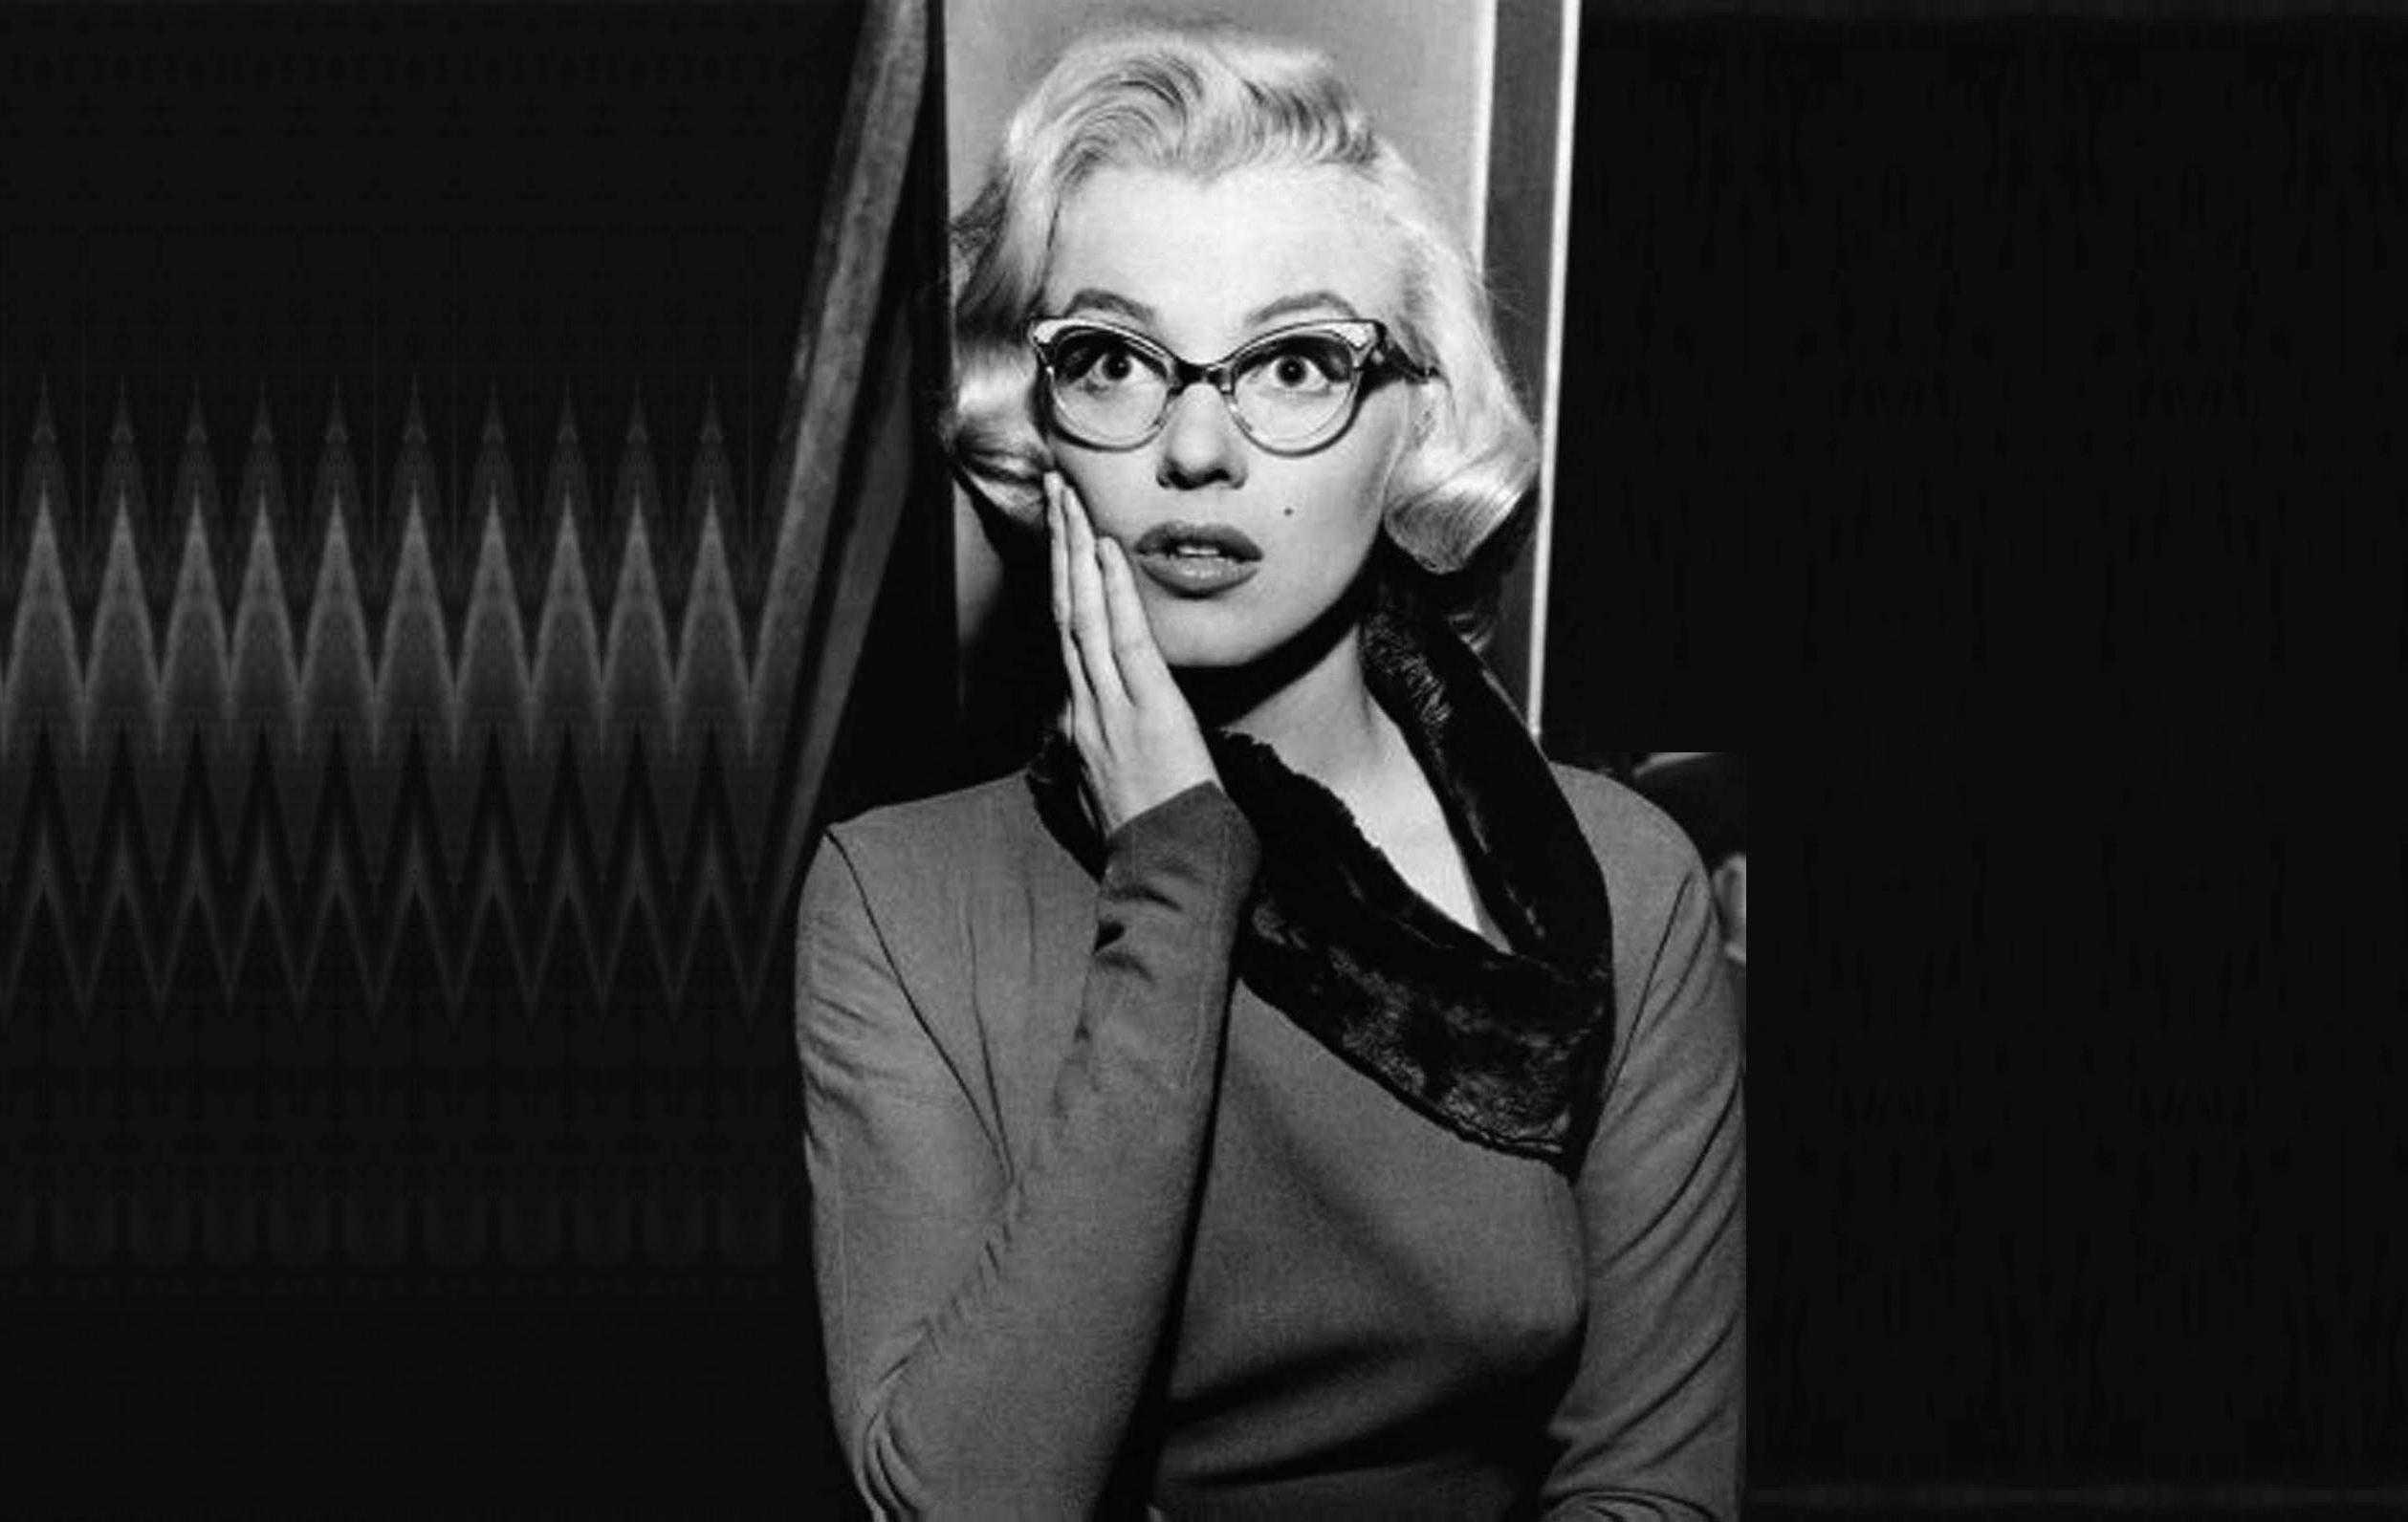 Res: 2518x1592, Images Hot Marilyn Monroe Wallpaper Hd For Mobile Phones Media File